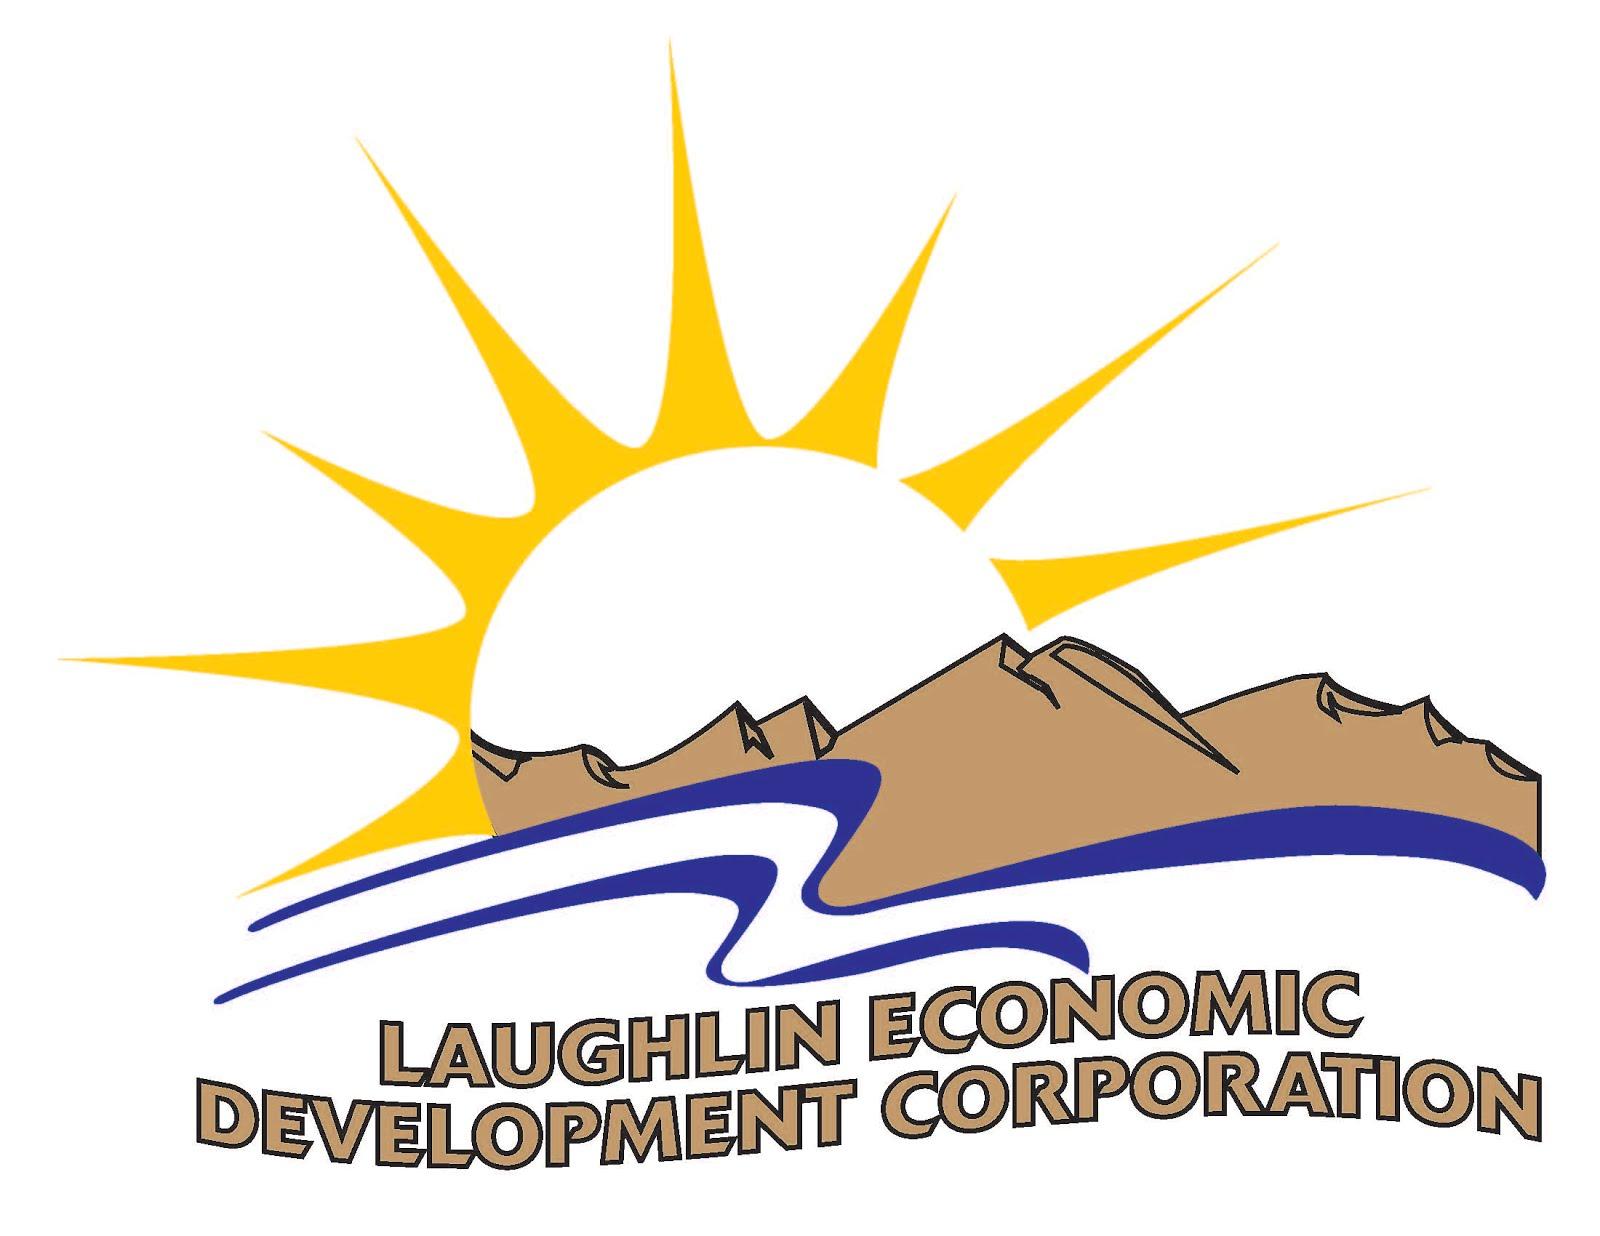 Laughlin Economic Development Corporation